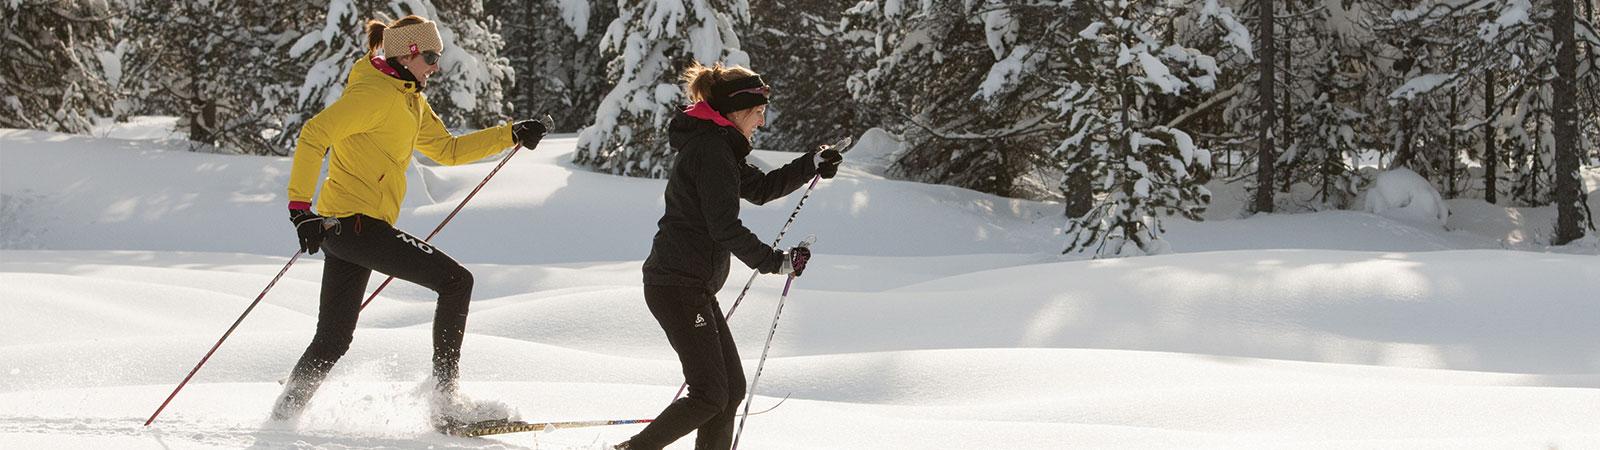 ski-de-fond-club-ffs-2